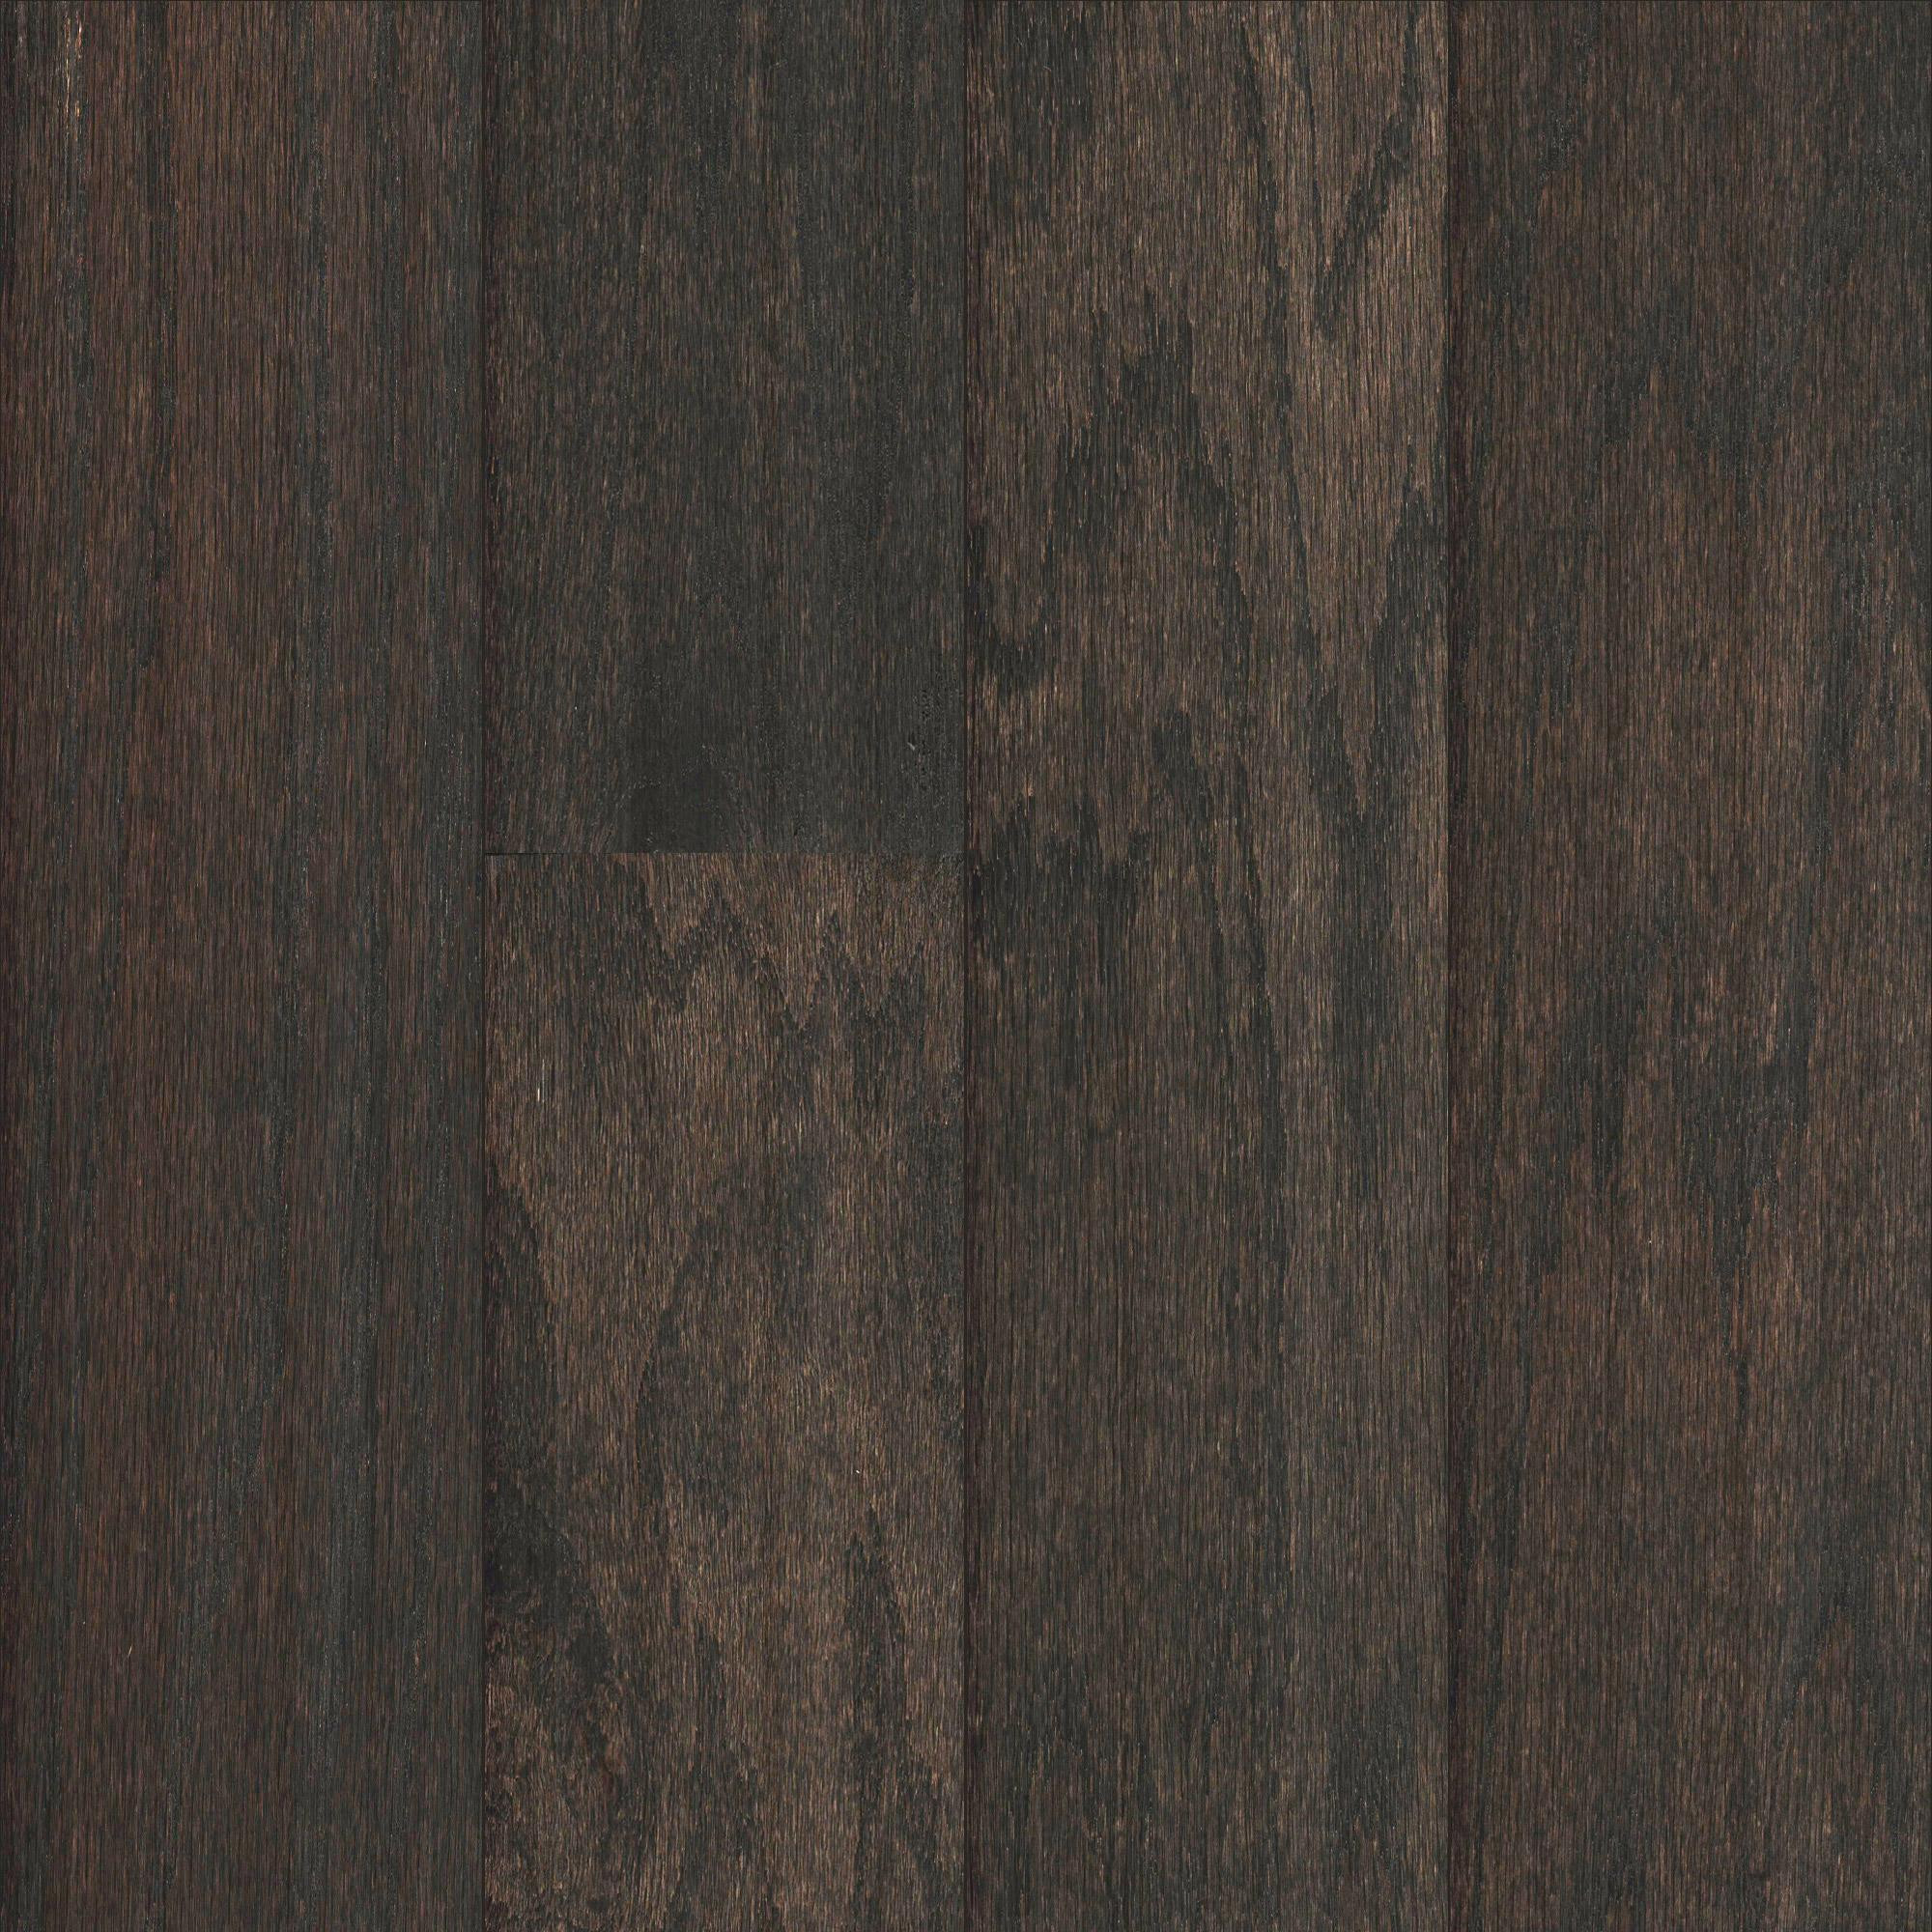 hardwood flooring 1000 sq ft of mullican newtown plank oak granite 1 2 thick 5 wide engineered inside mullican newtown plank oak granite 1 2 thick 5 wide engineered hardwood flooring